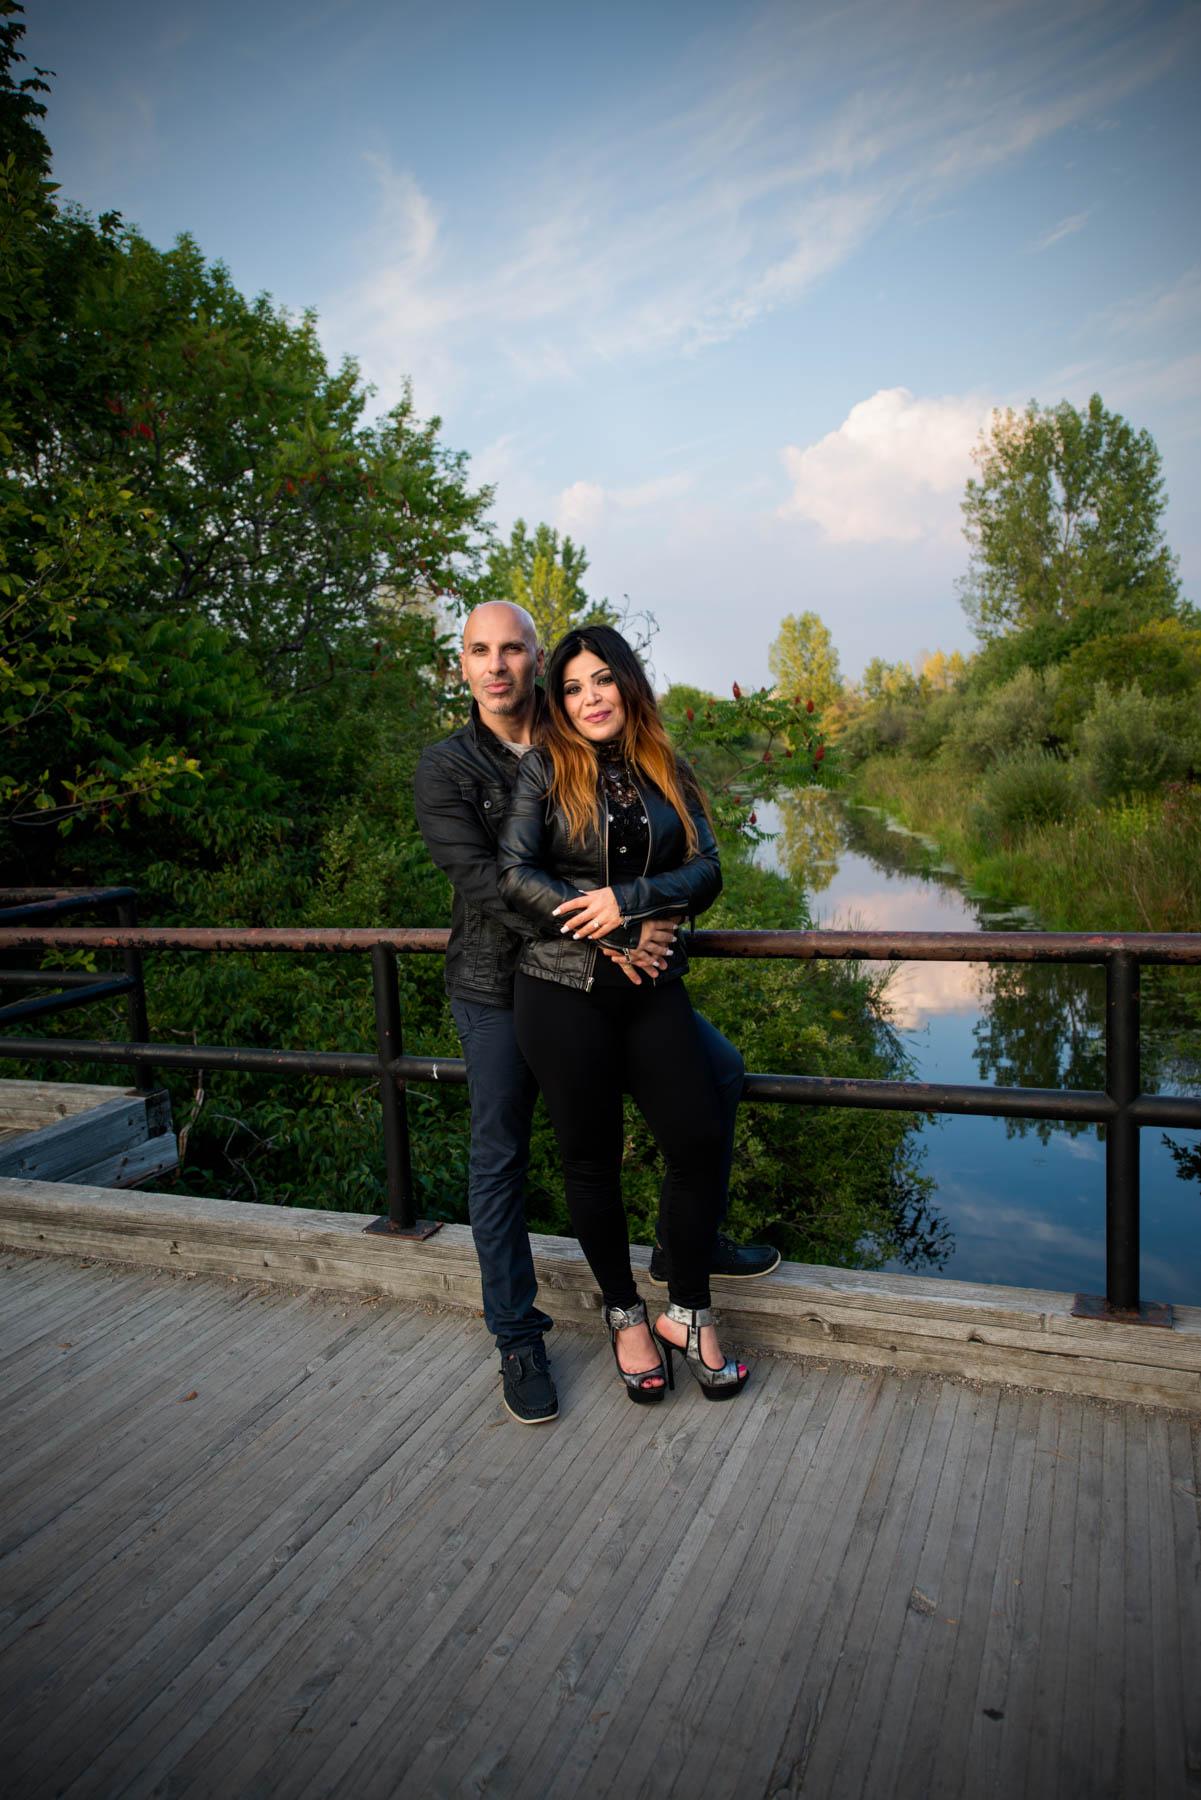 054 - Engagement FL Humber Bay Park - Toronto